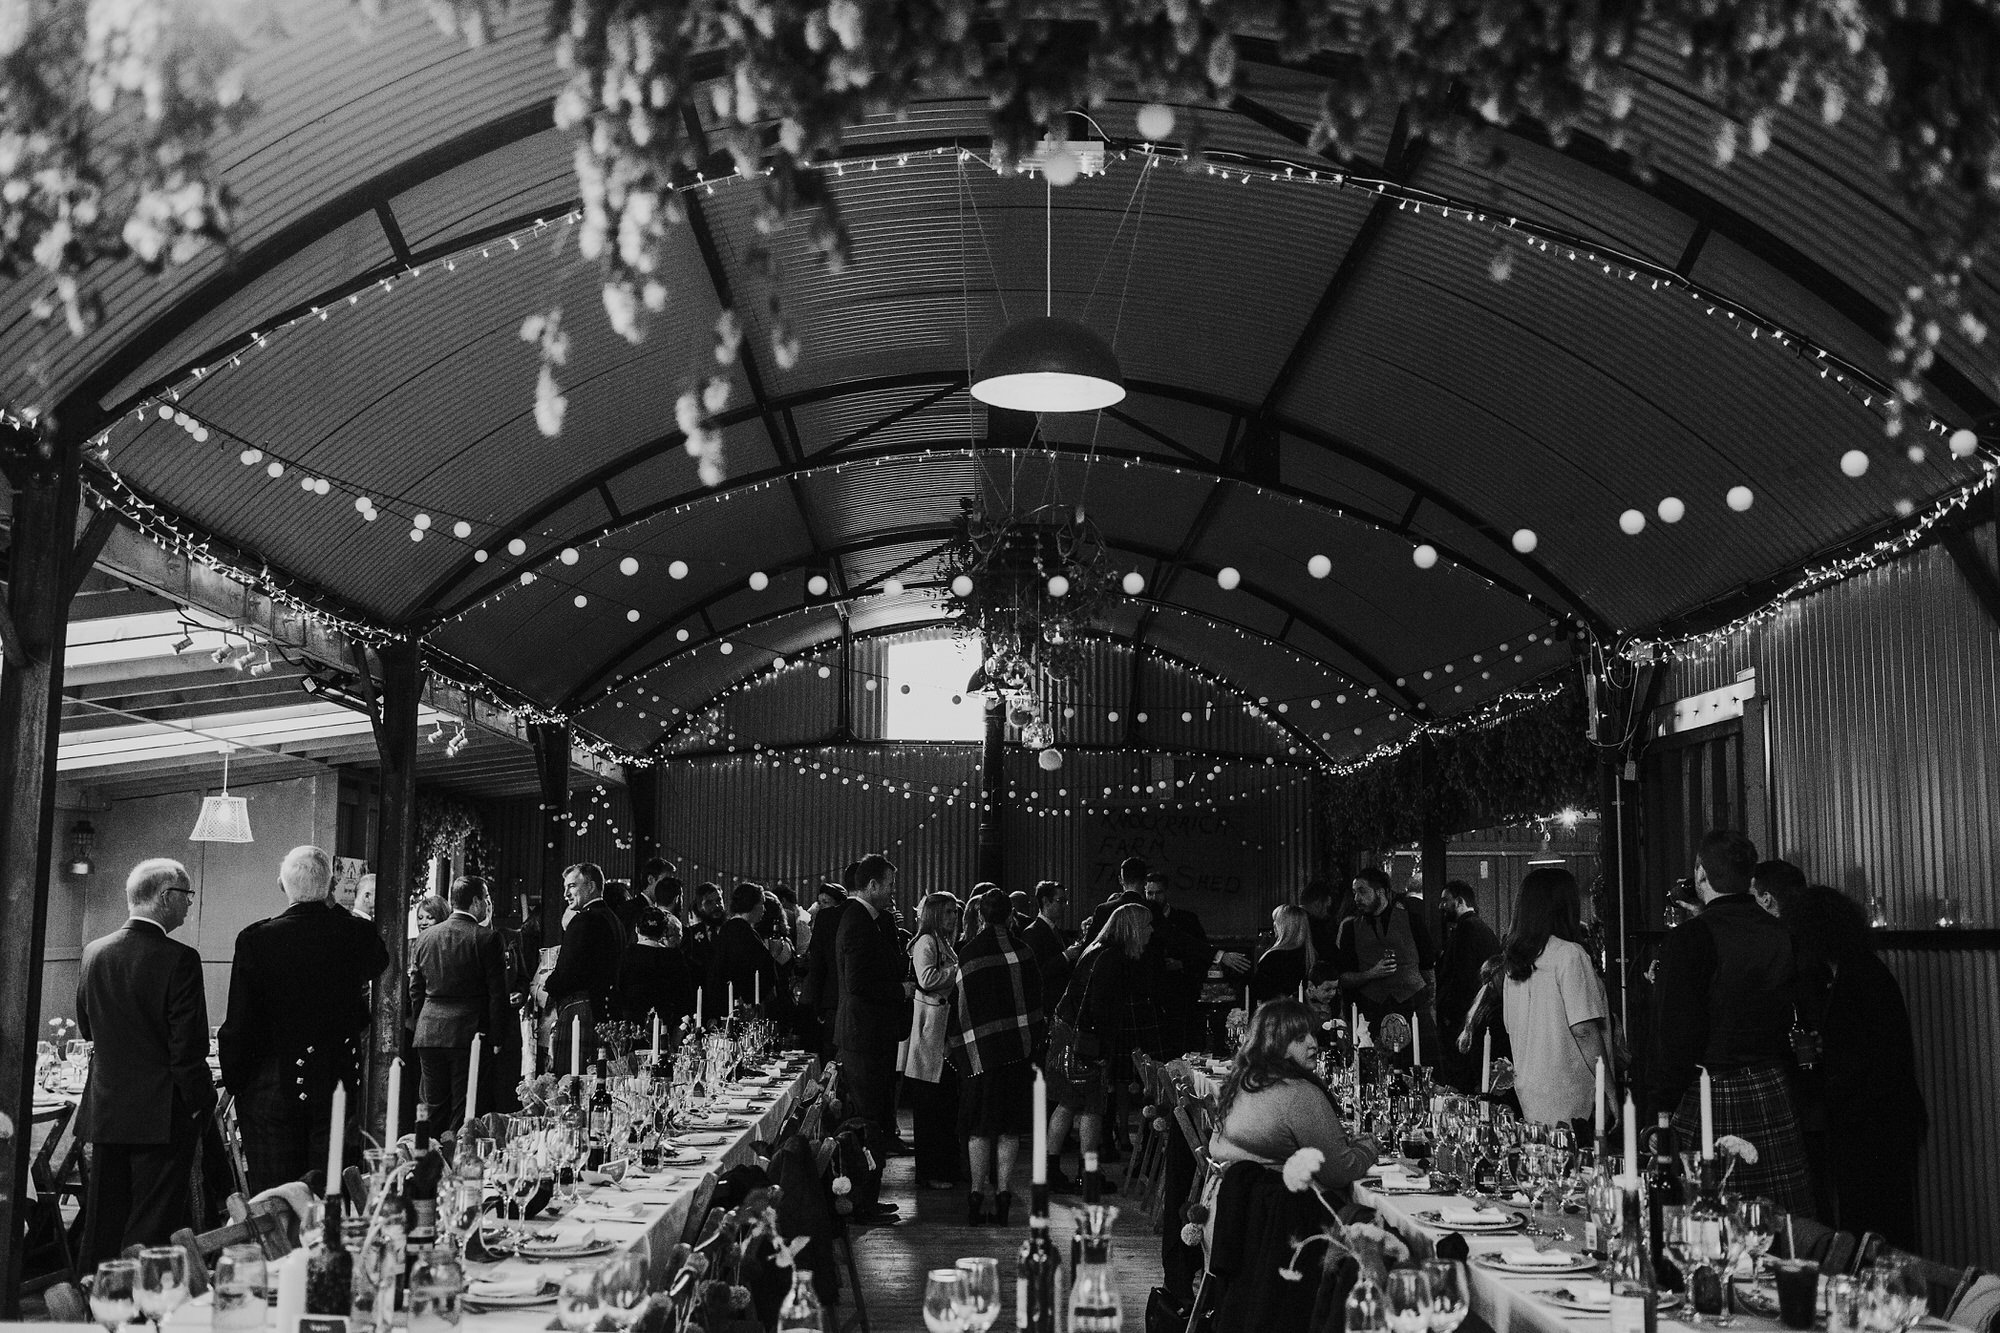 044 TIN SHED KNOCKRAICH FARM WEDDING ALTERNATIVE BRIDE ZOE ALEXANDRA PHOTOGRAPHY